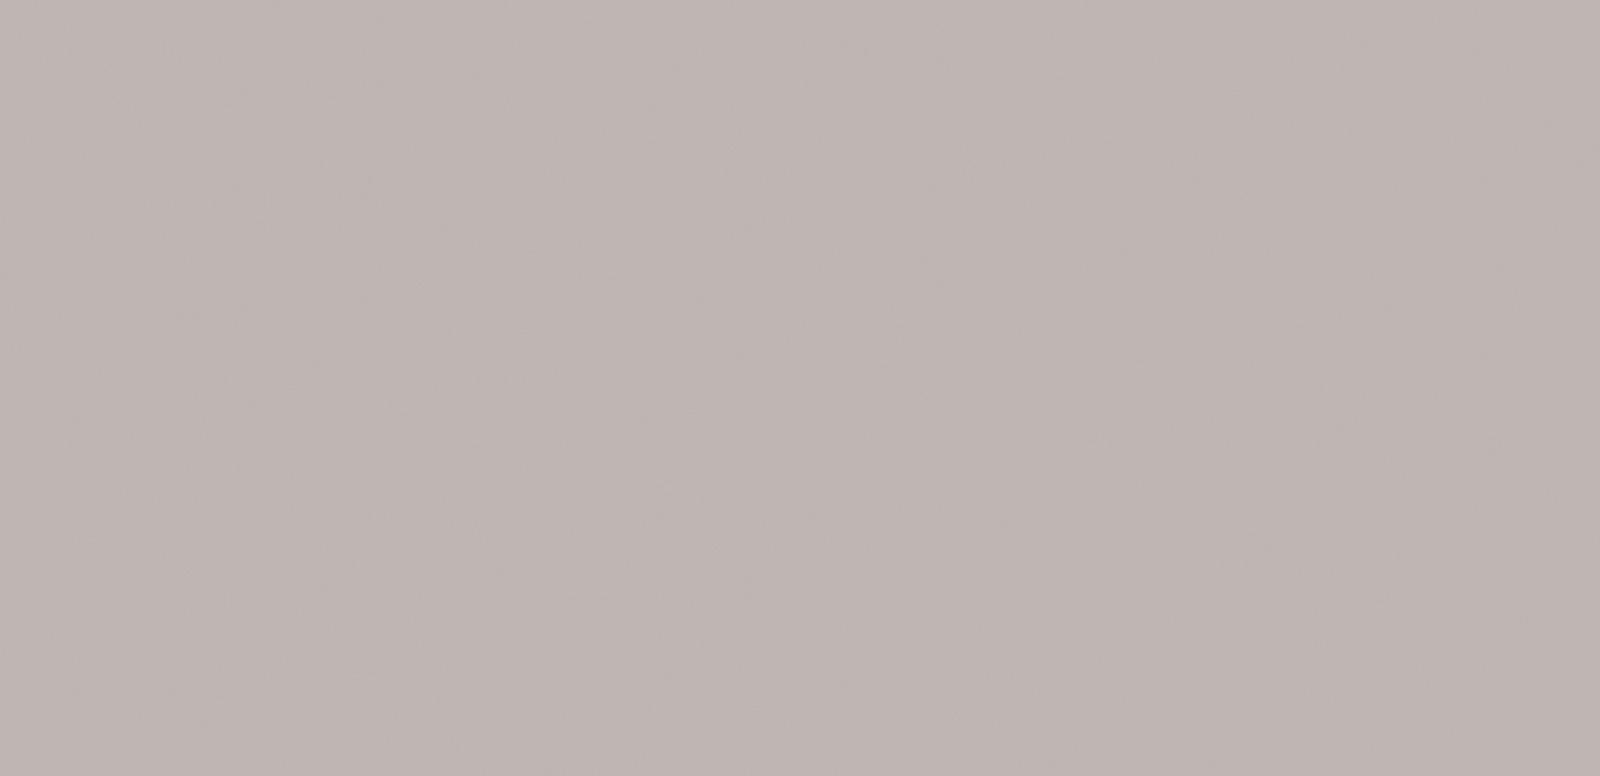 plan de travail 33 gris clair en dekton